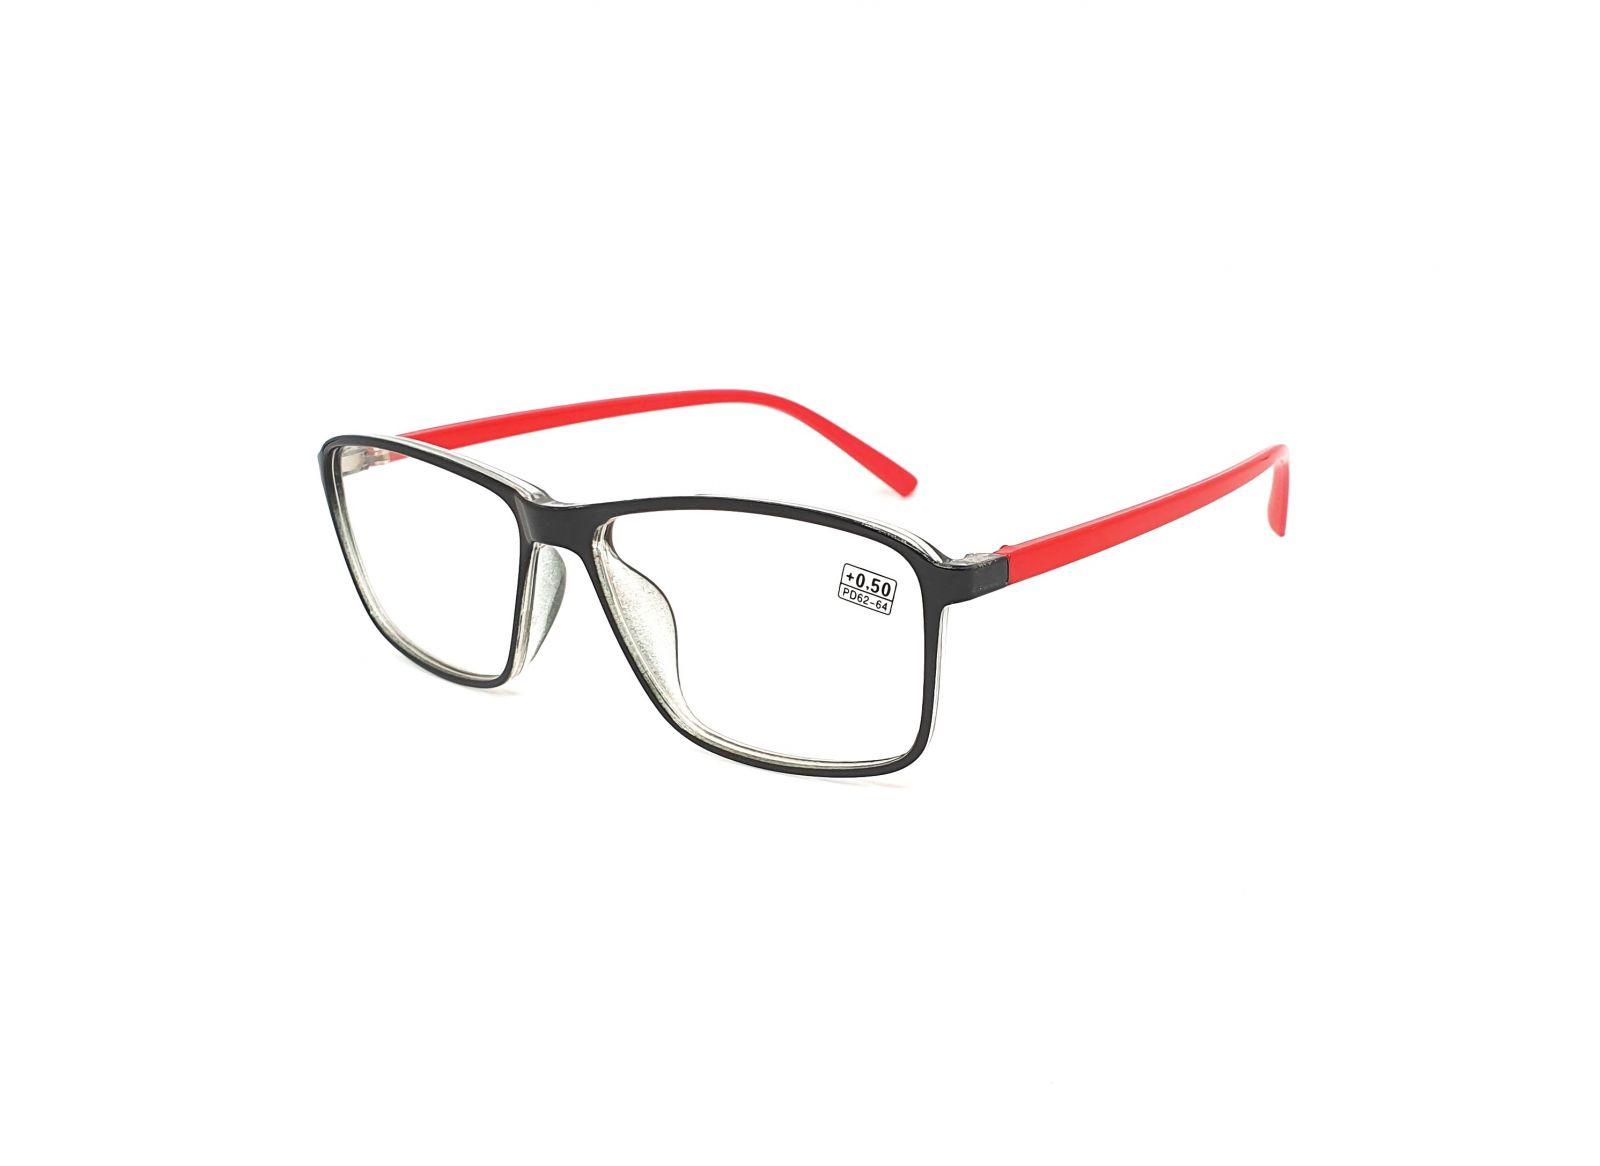 Dioptrické brýle 17218 / +0,50 red